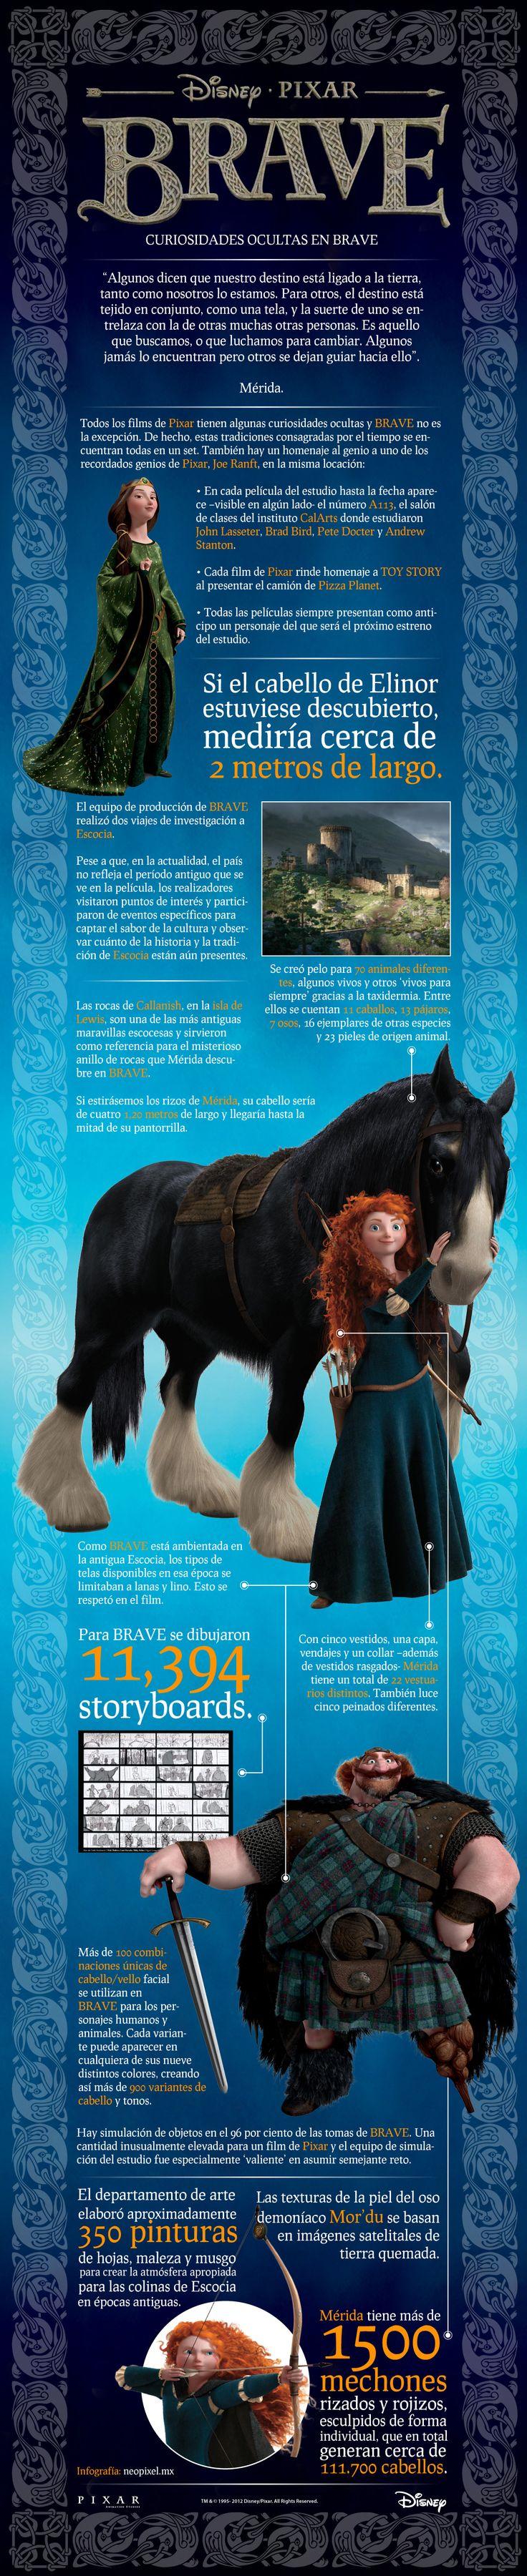 Curiosidades de la película Brave (Pixar) #infografia #infographic